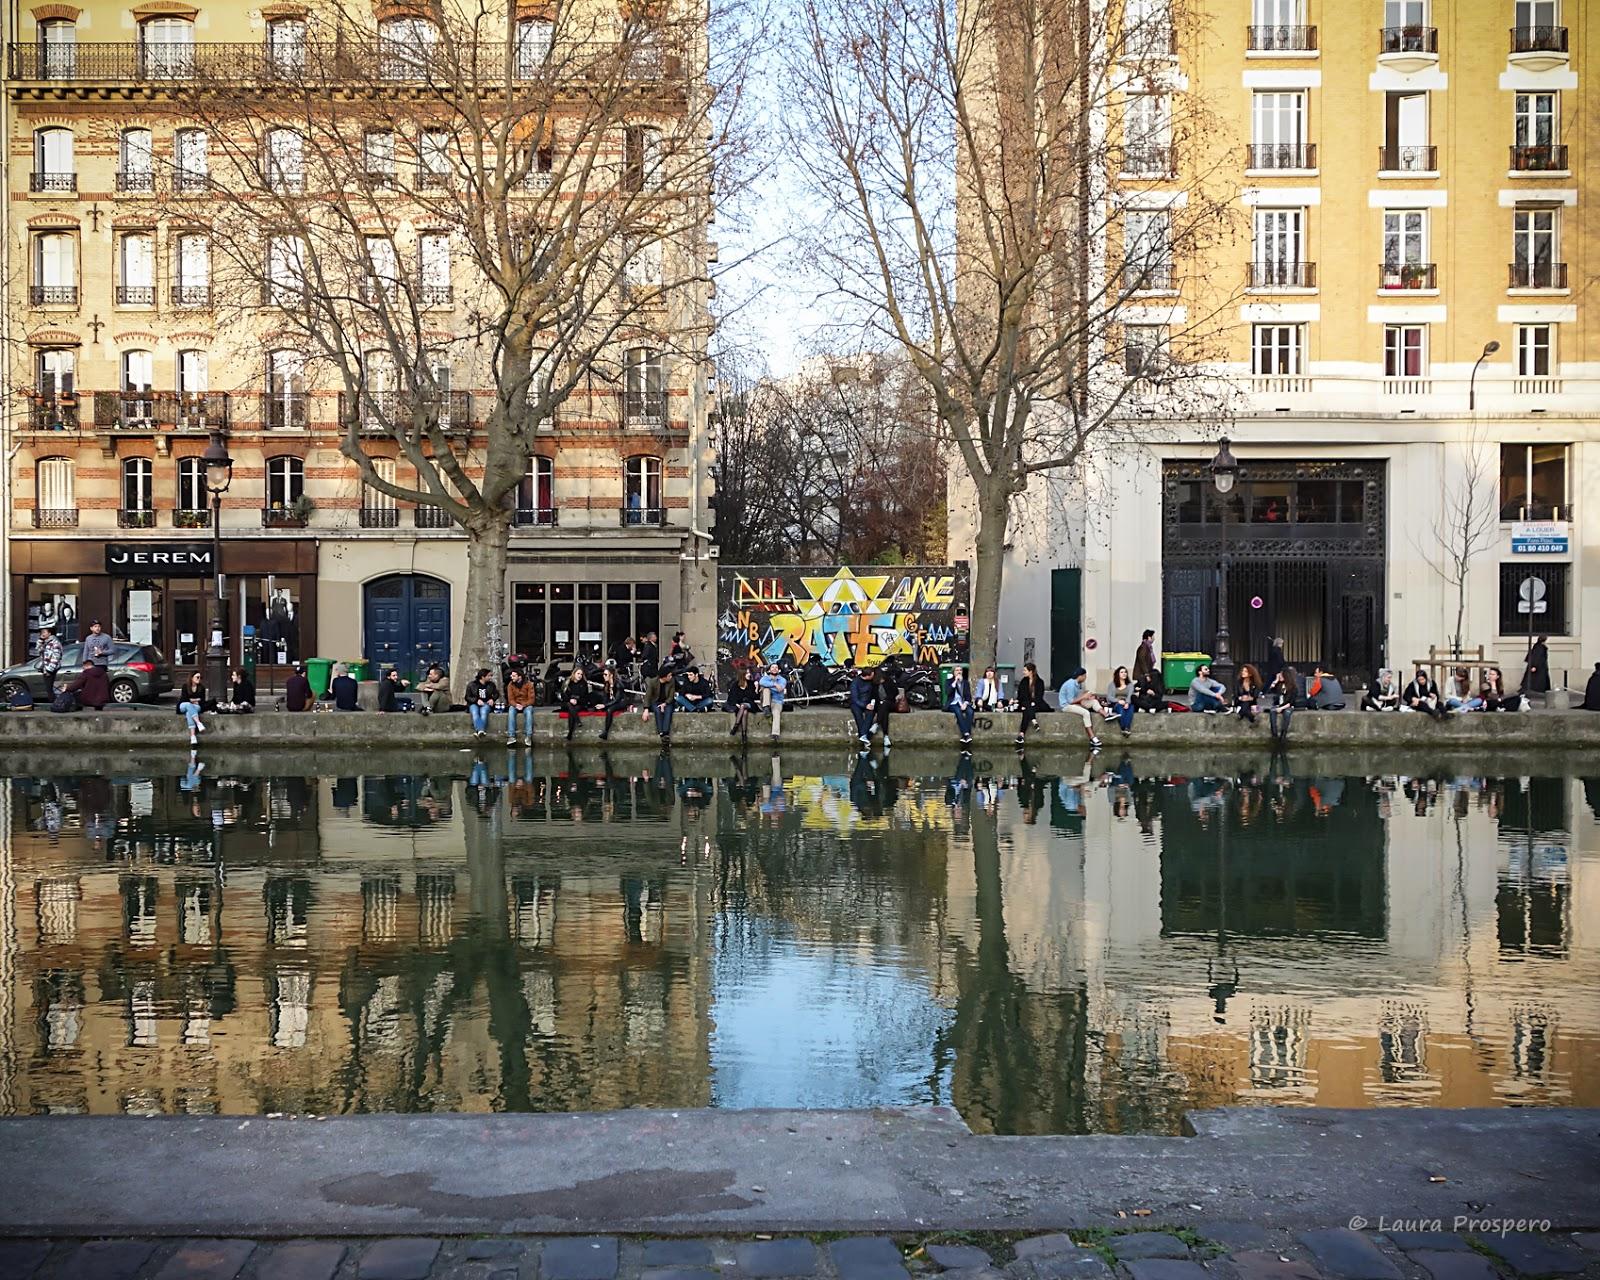 canal st martin 18-03-15 © Laura Prospero